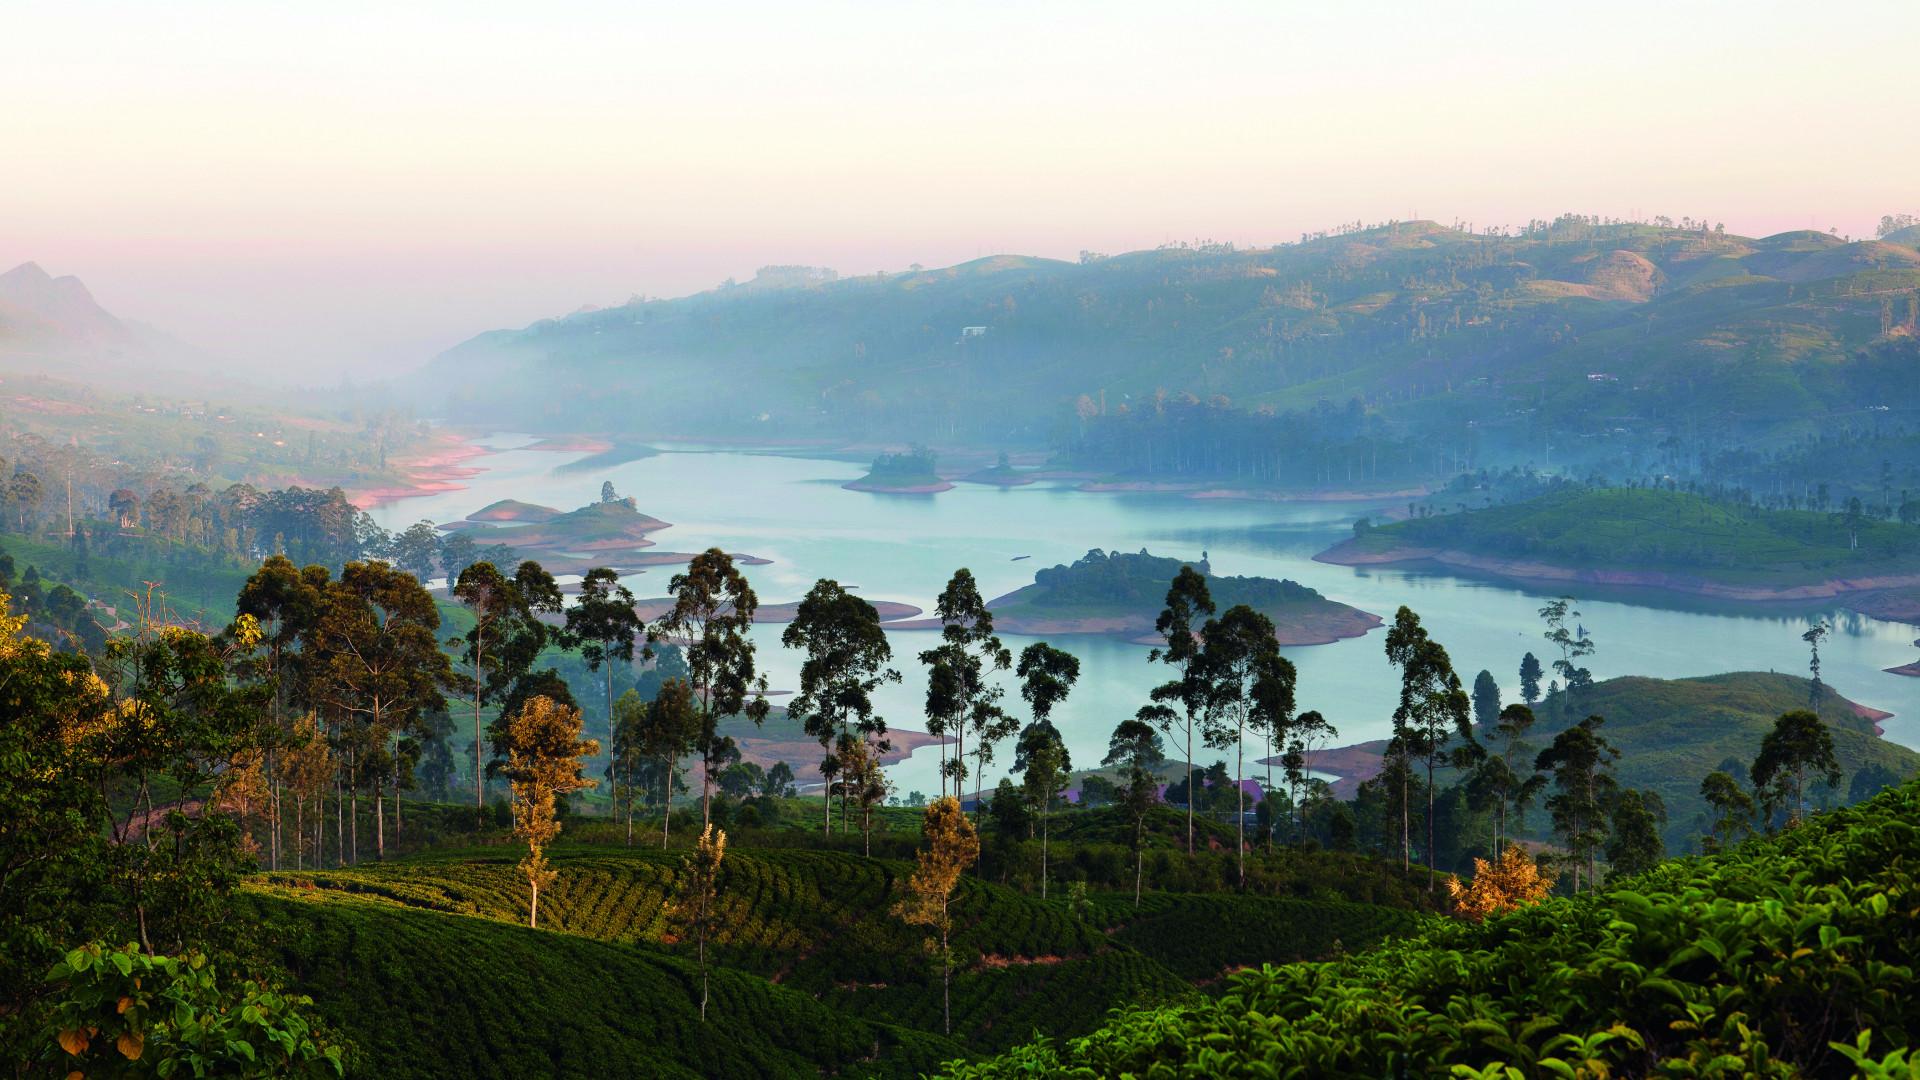 Castlereagh Lake, as seen from Tea Trails' Resplendent Ceylon bungalows